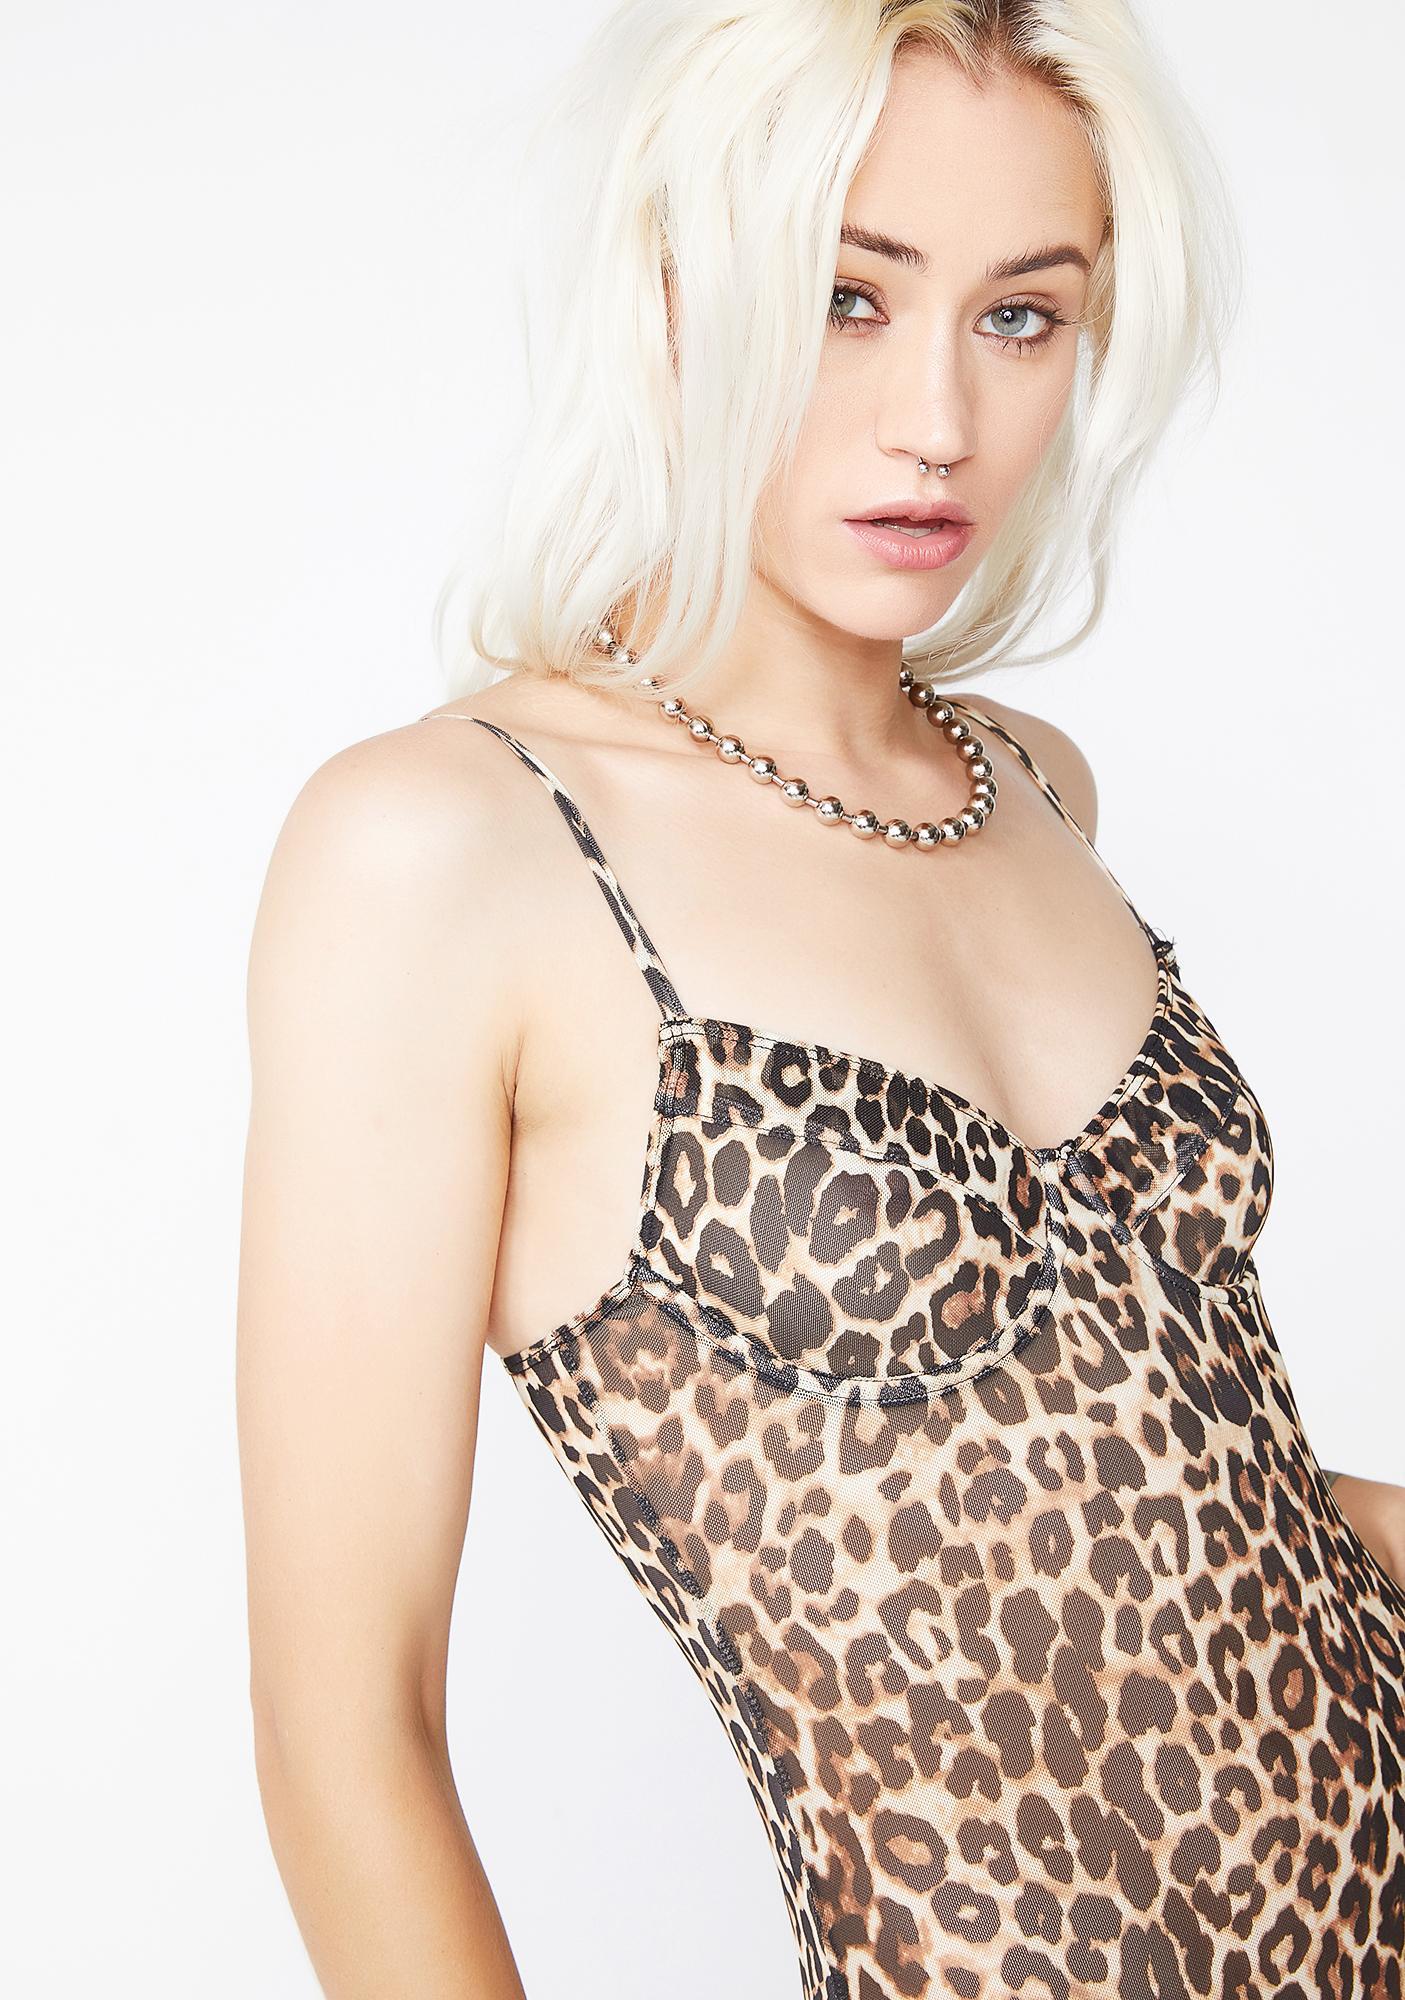 In The Wild Leopard Bodysuit